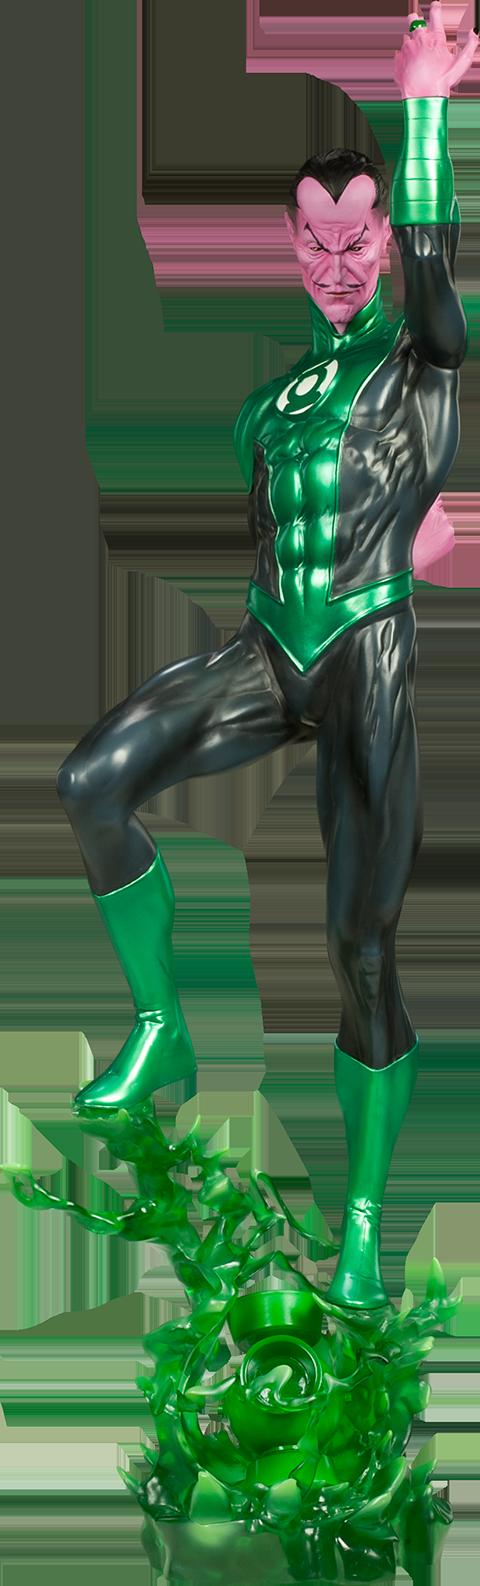 Sideshow Collectibles Sinestro - Green Lantern Corps Premium Format Figure